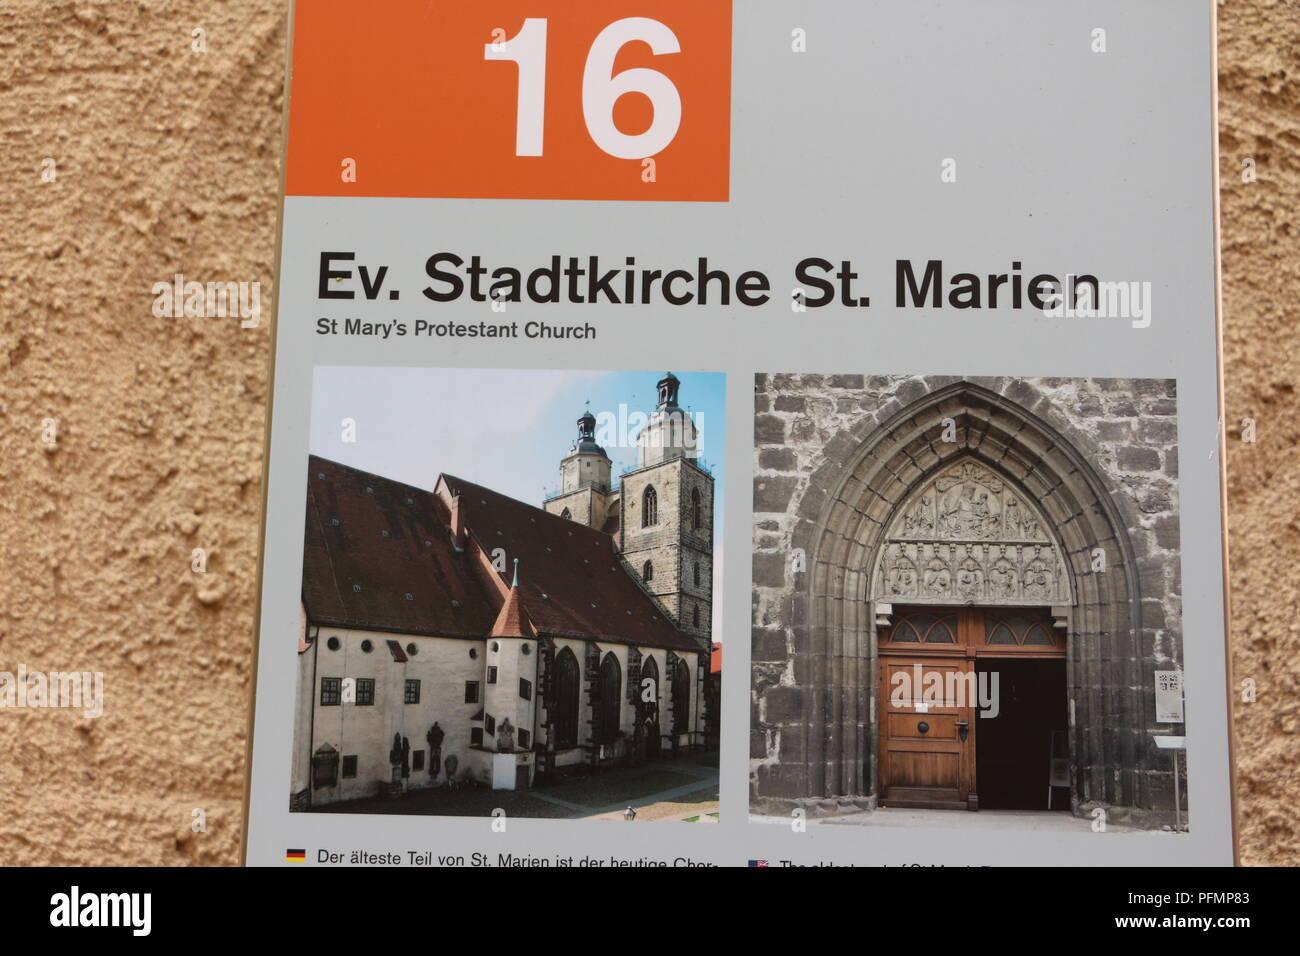 Hinweisschild 'Ev. Stadtkirche St. Marien' in Lutherstadt Wittenberg - Stock Image